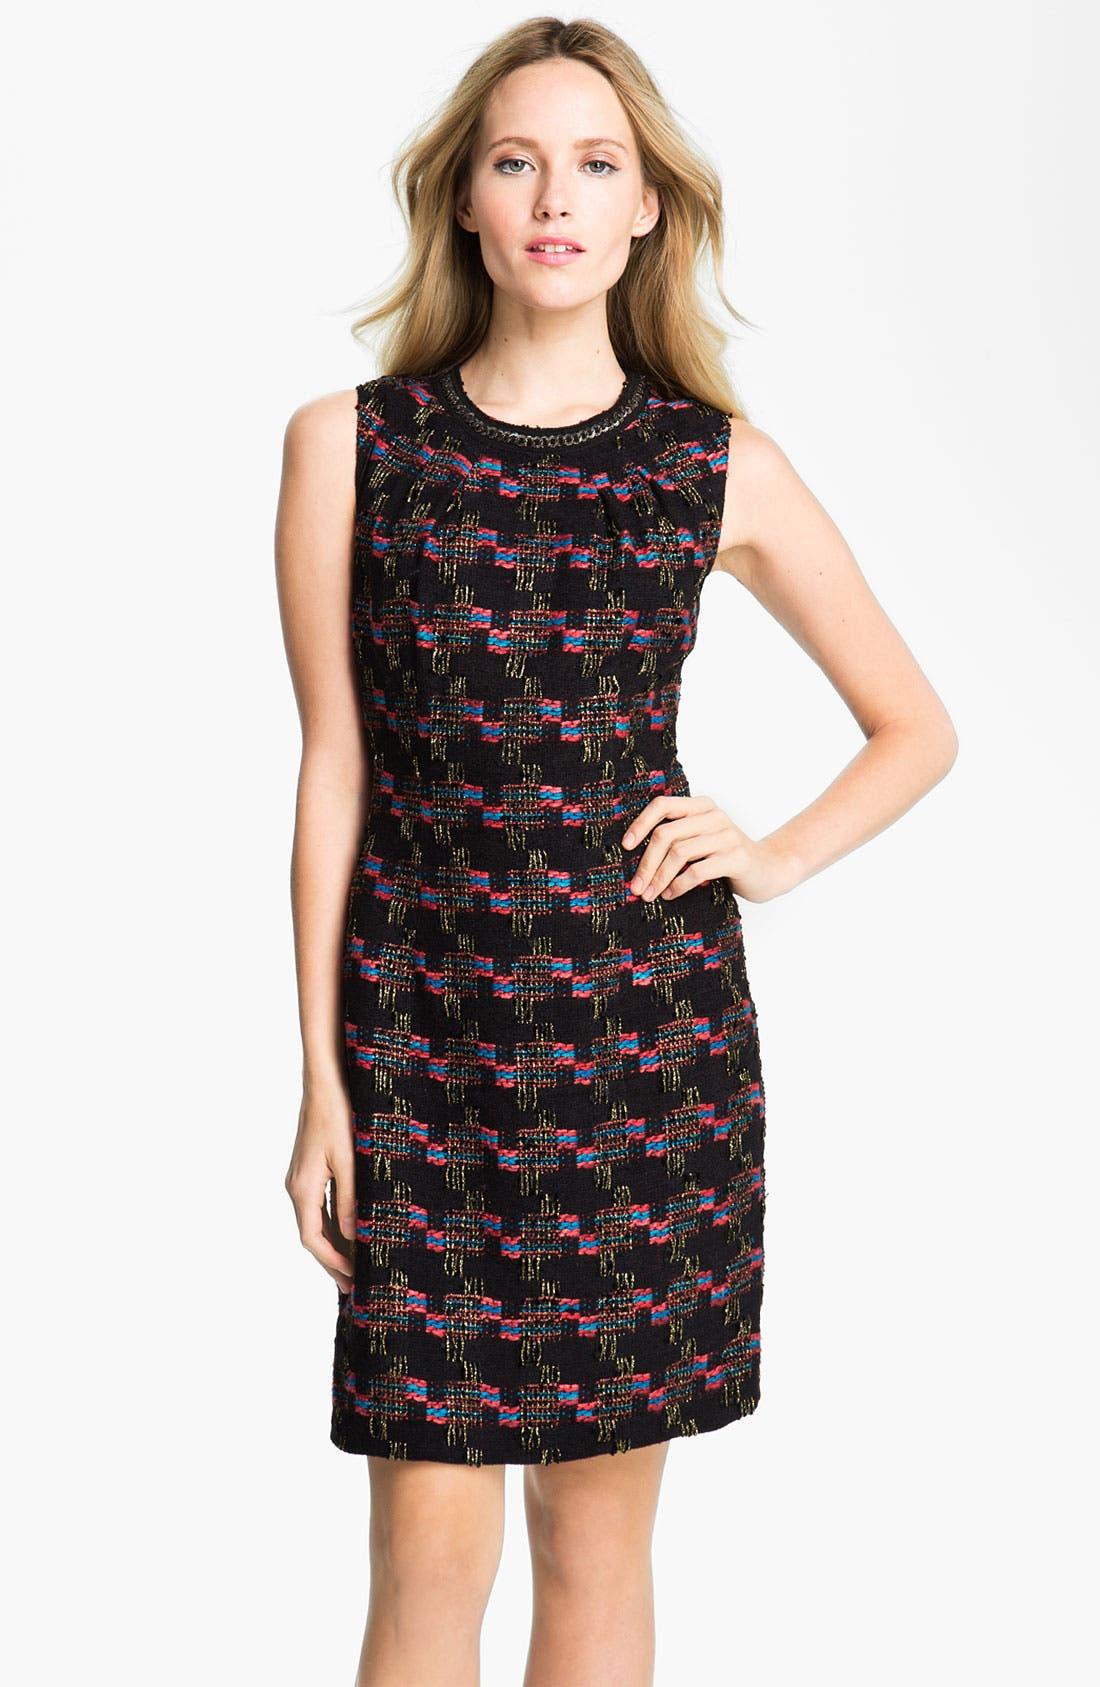 Alternate Image 1 Selected - Trina Turk 'Good Night' Tweed Sheath Dress